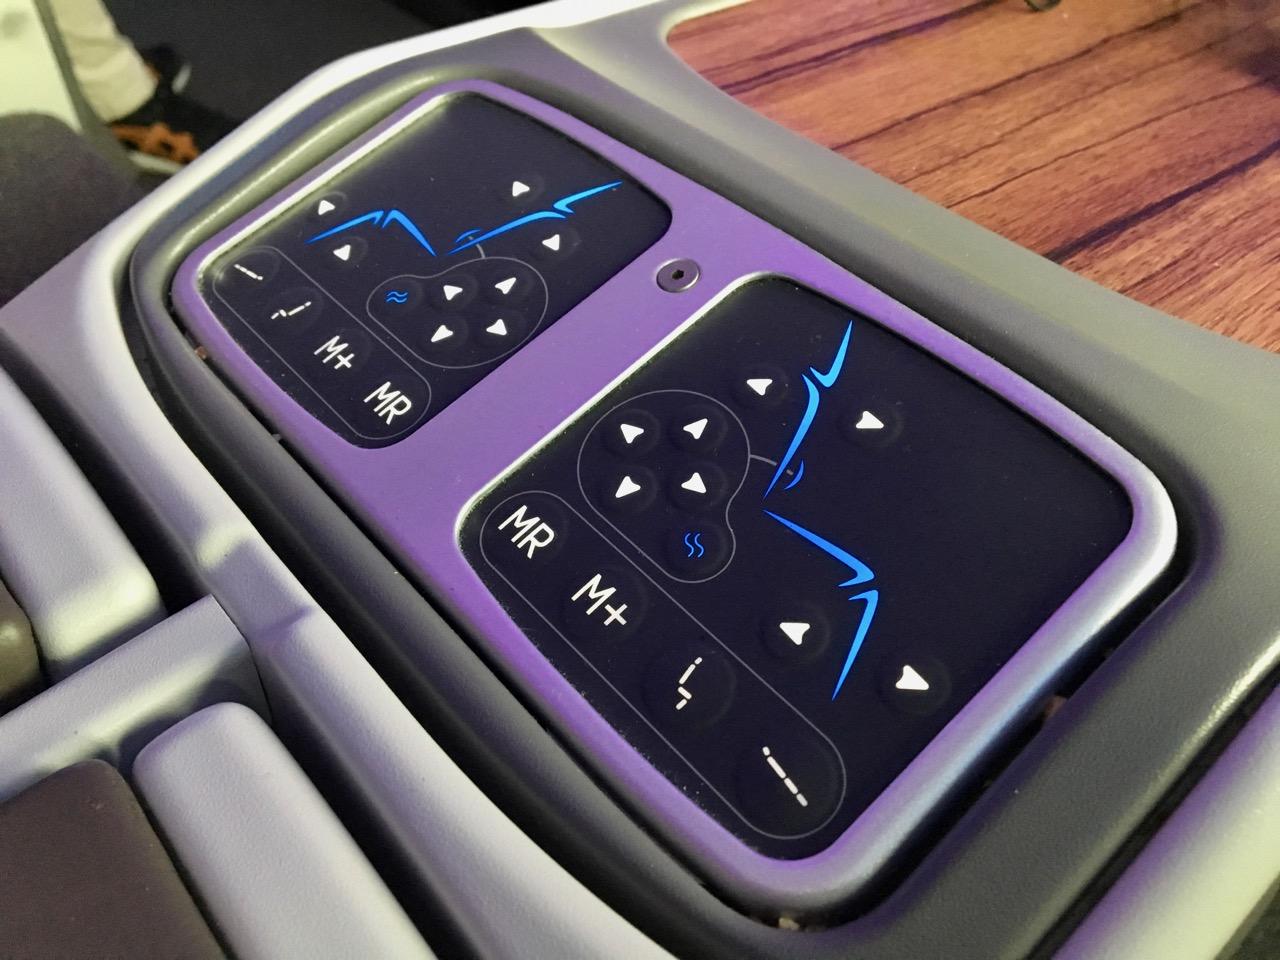 LATAM 787 Business Class seat control